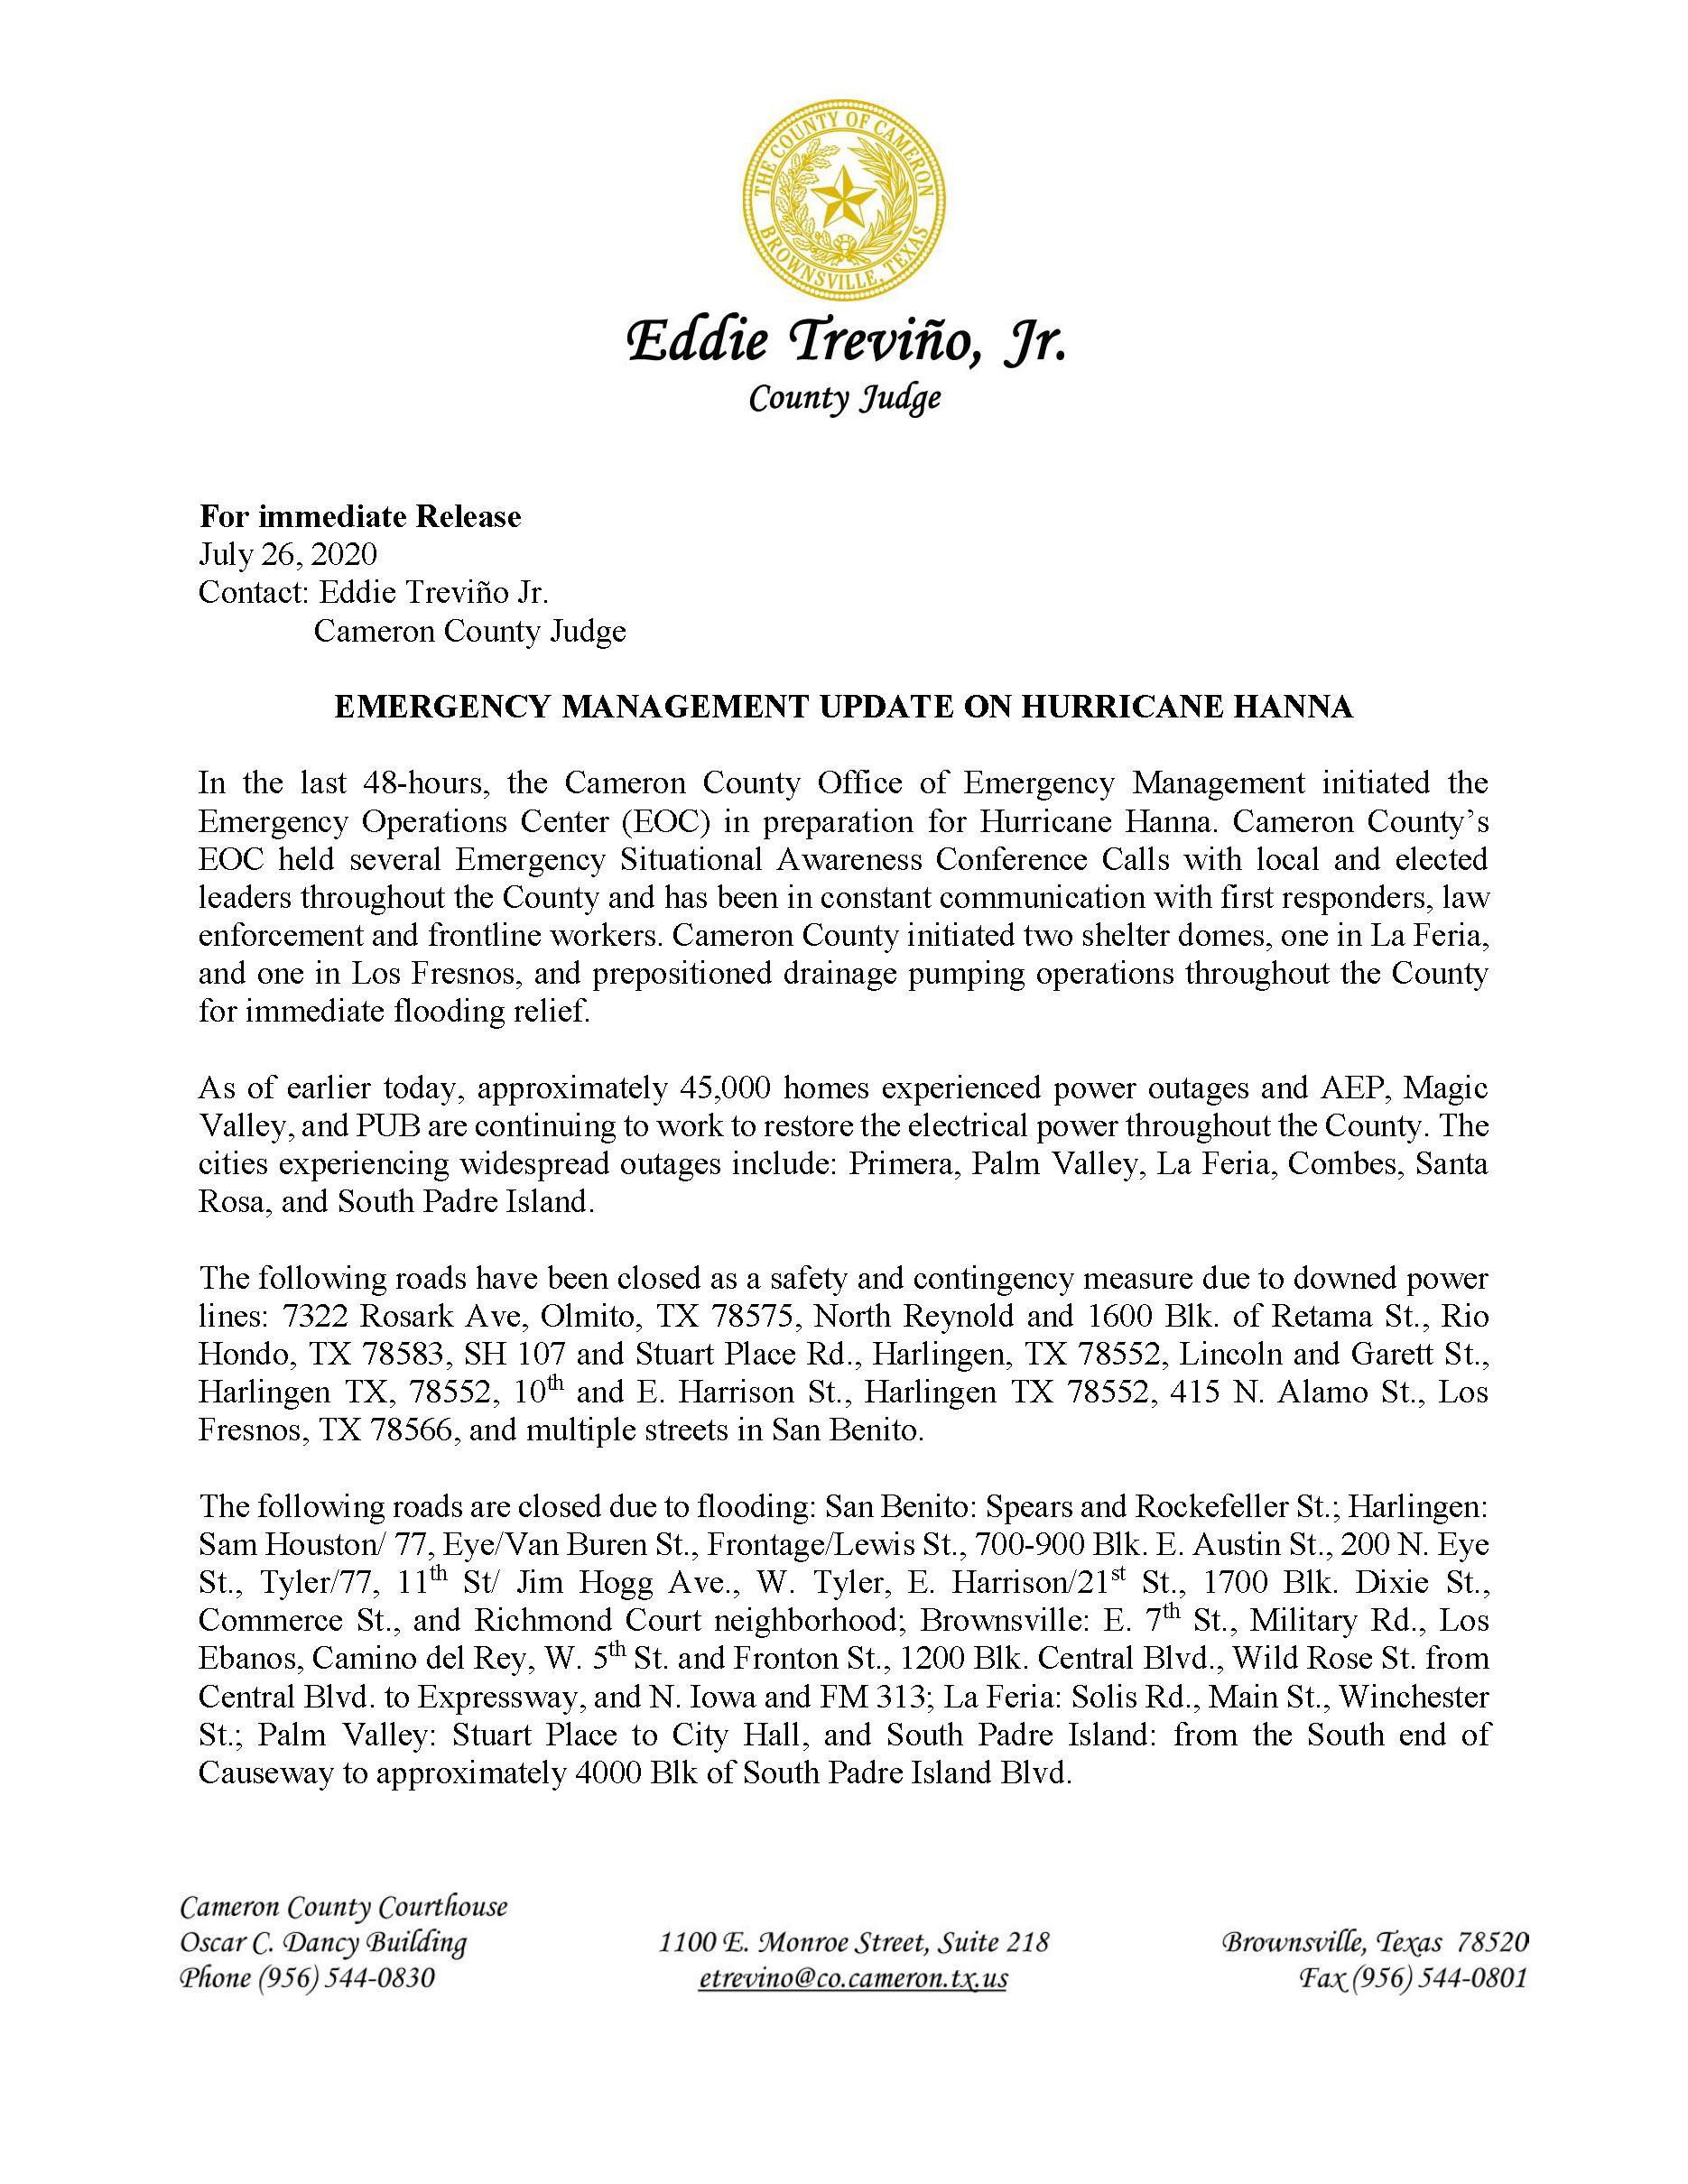 PR EM Updates On Hurricane Hanna PDF Page 1